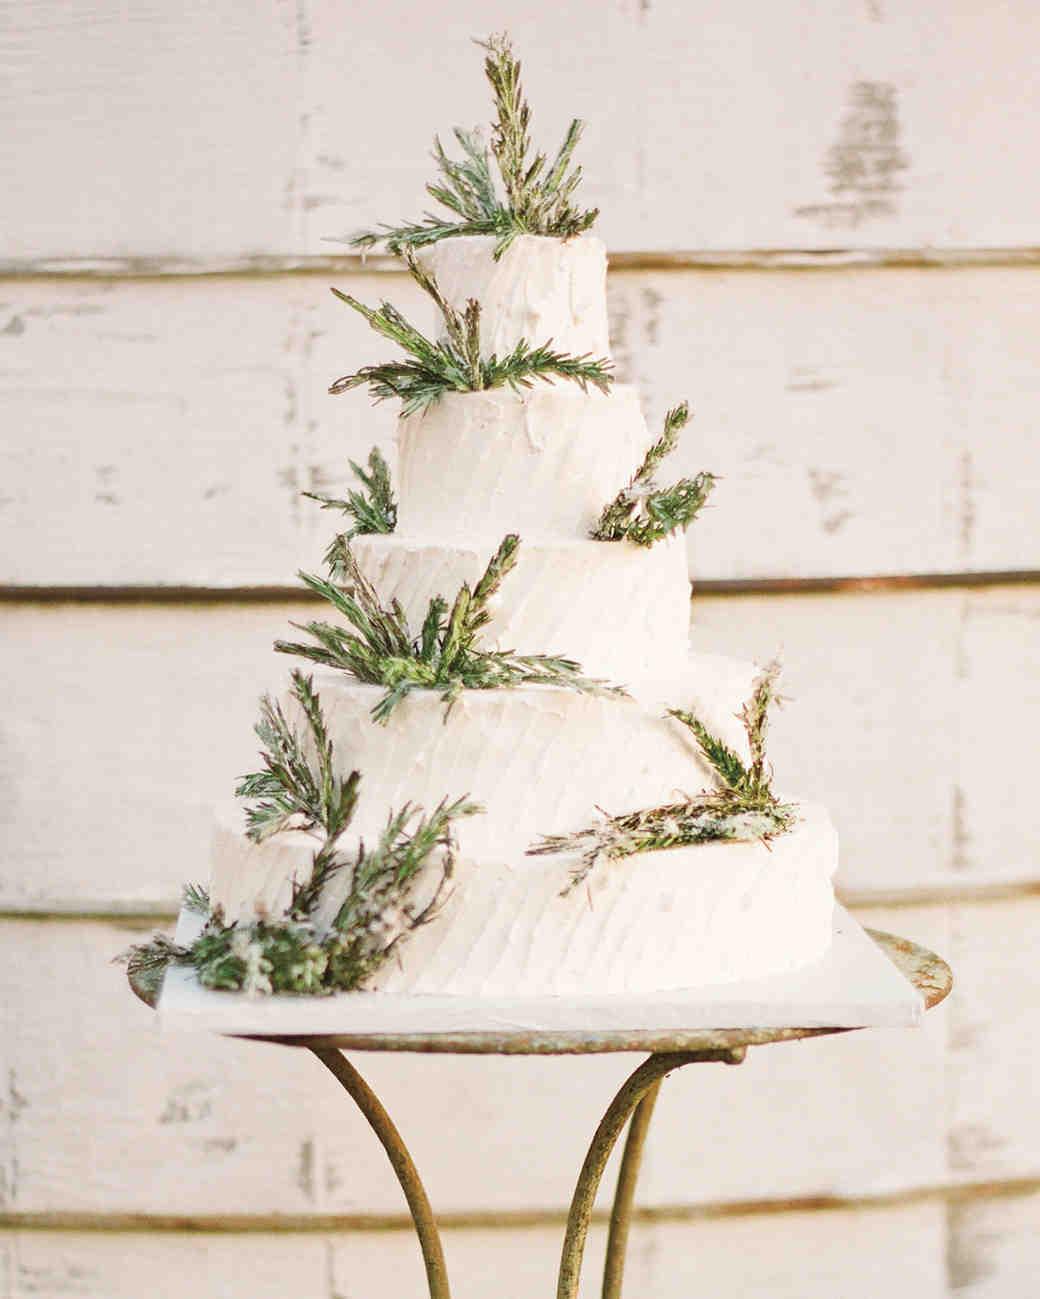 alanna-craig-cake-1346-mwds110658.jpg